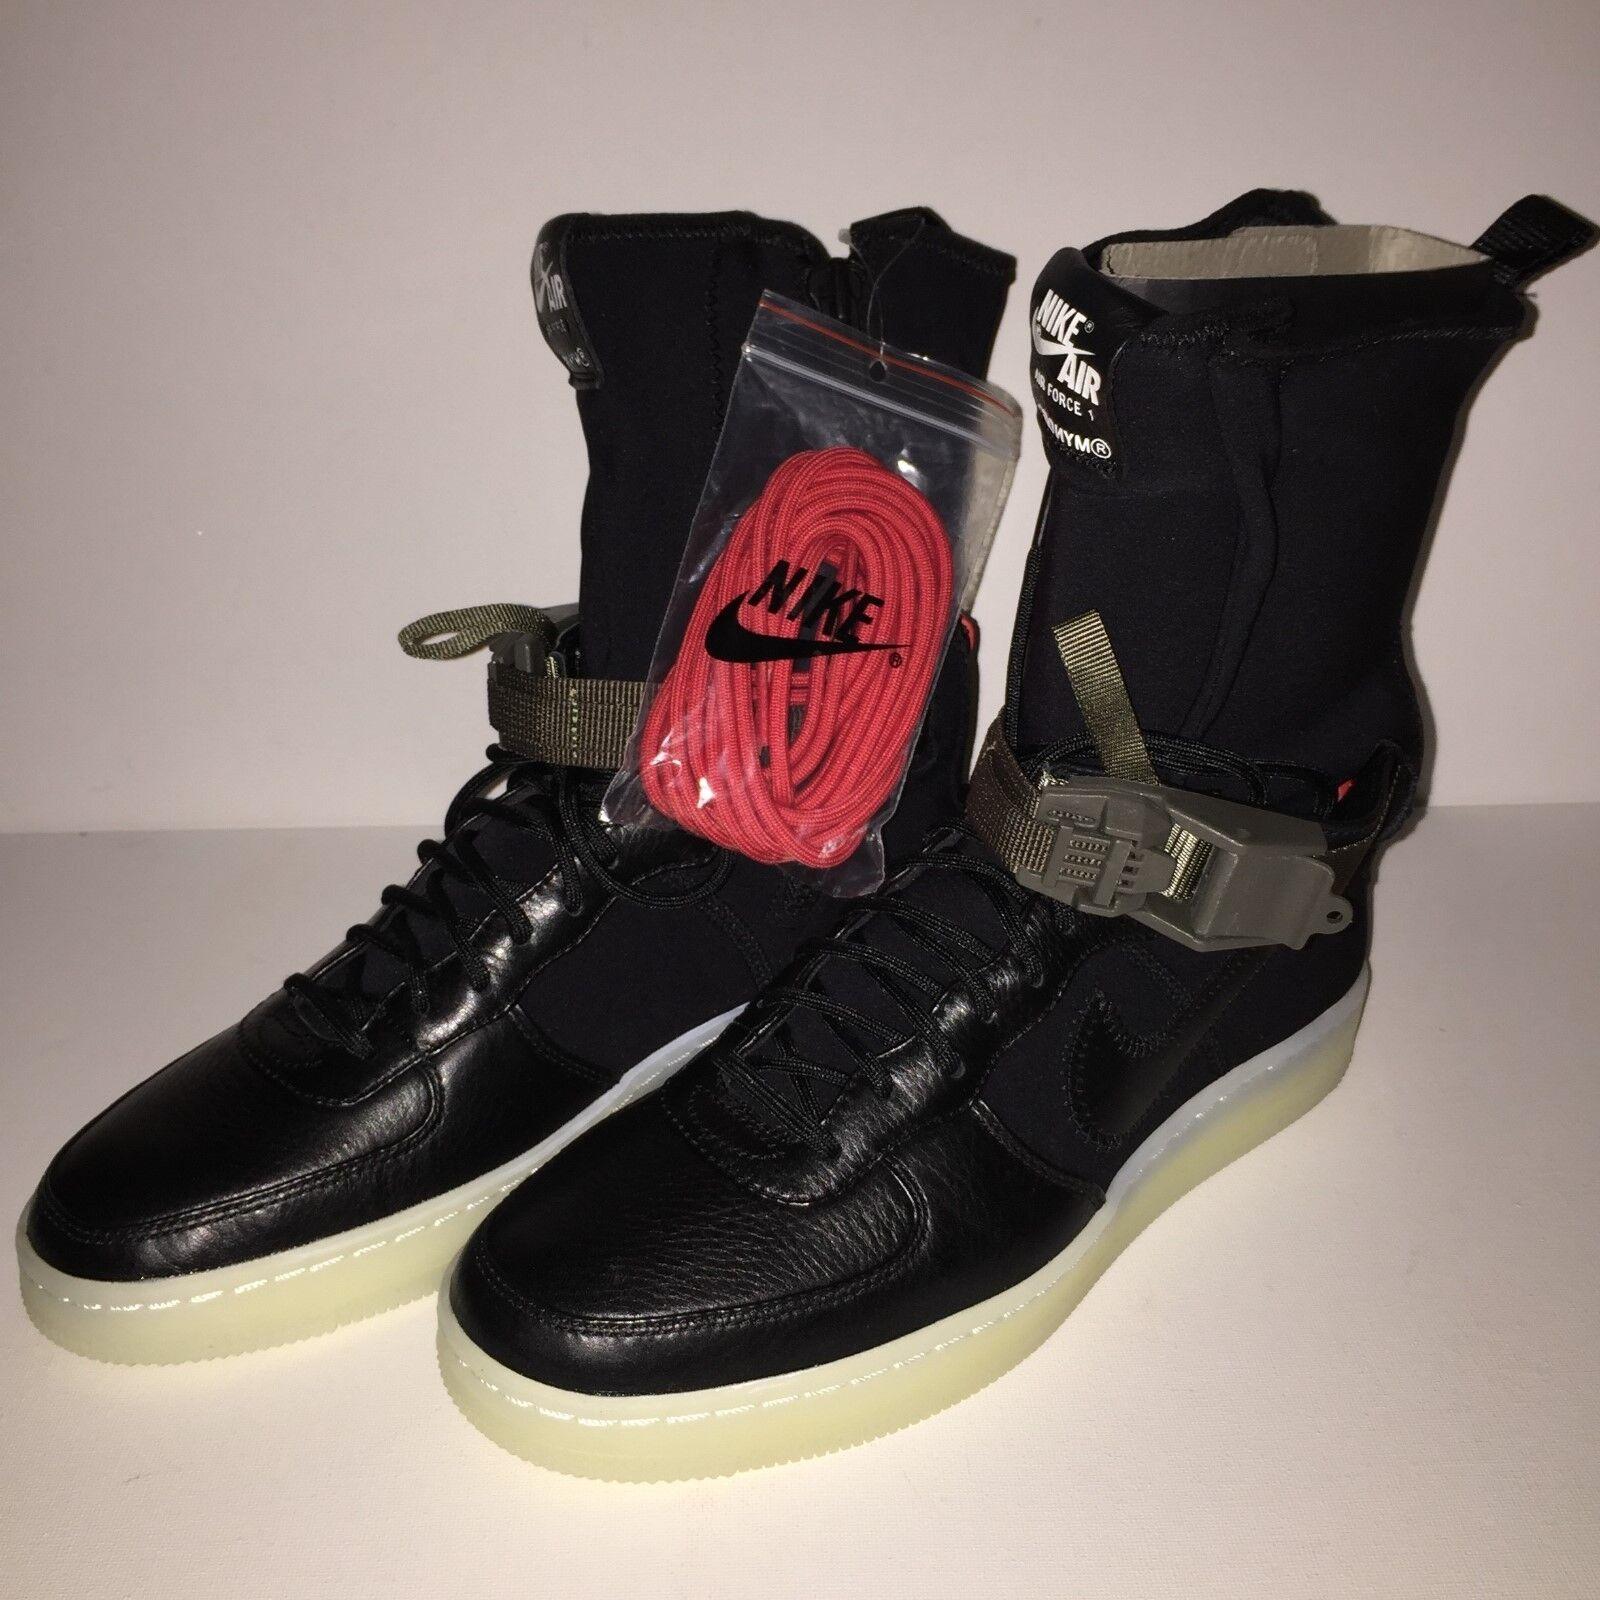 NikeLab x Acronym AF1 Downtown Hi SP-Size UK 6.5 - Black Red (649941-006)